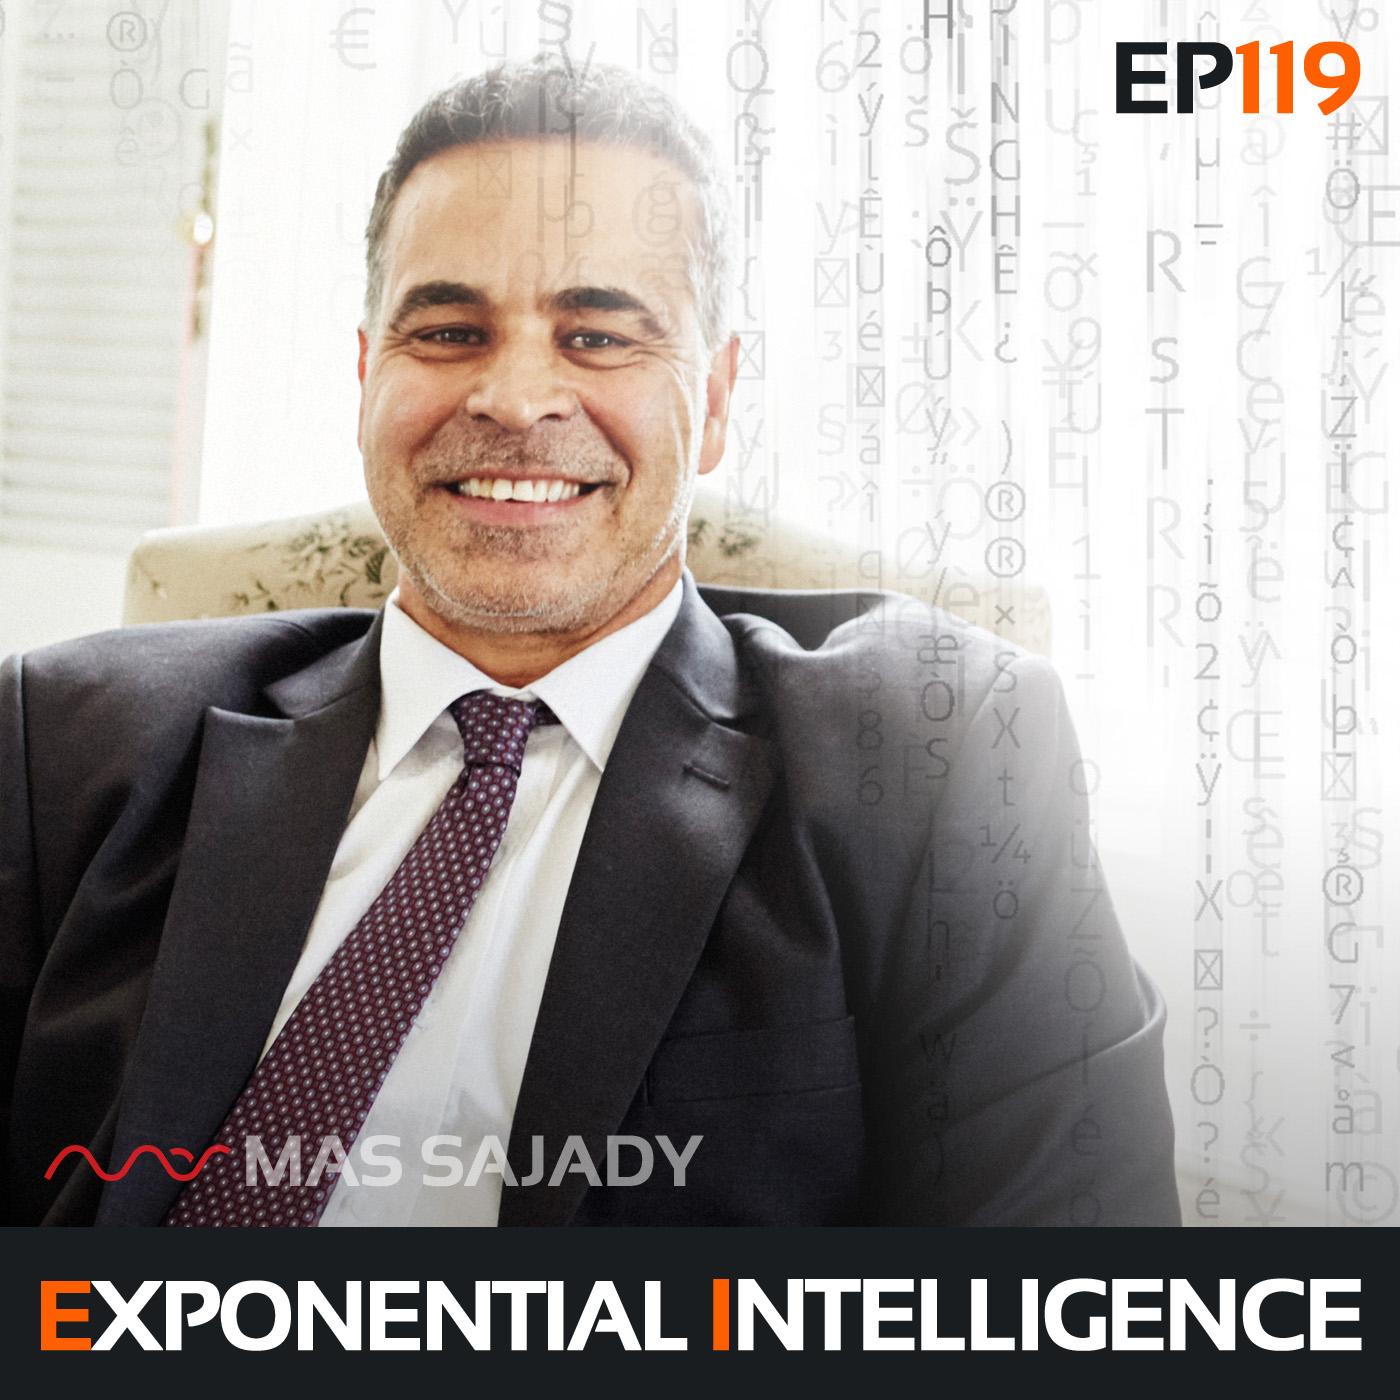 119 episode art - exponential intelligence.jpg